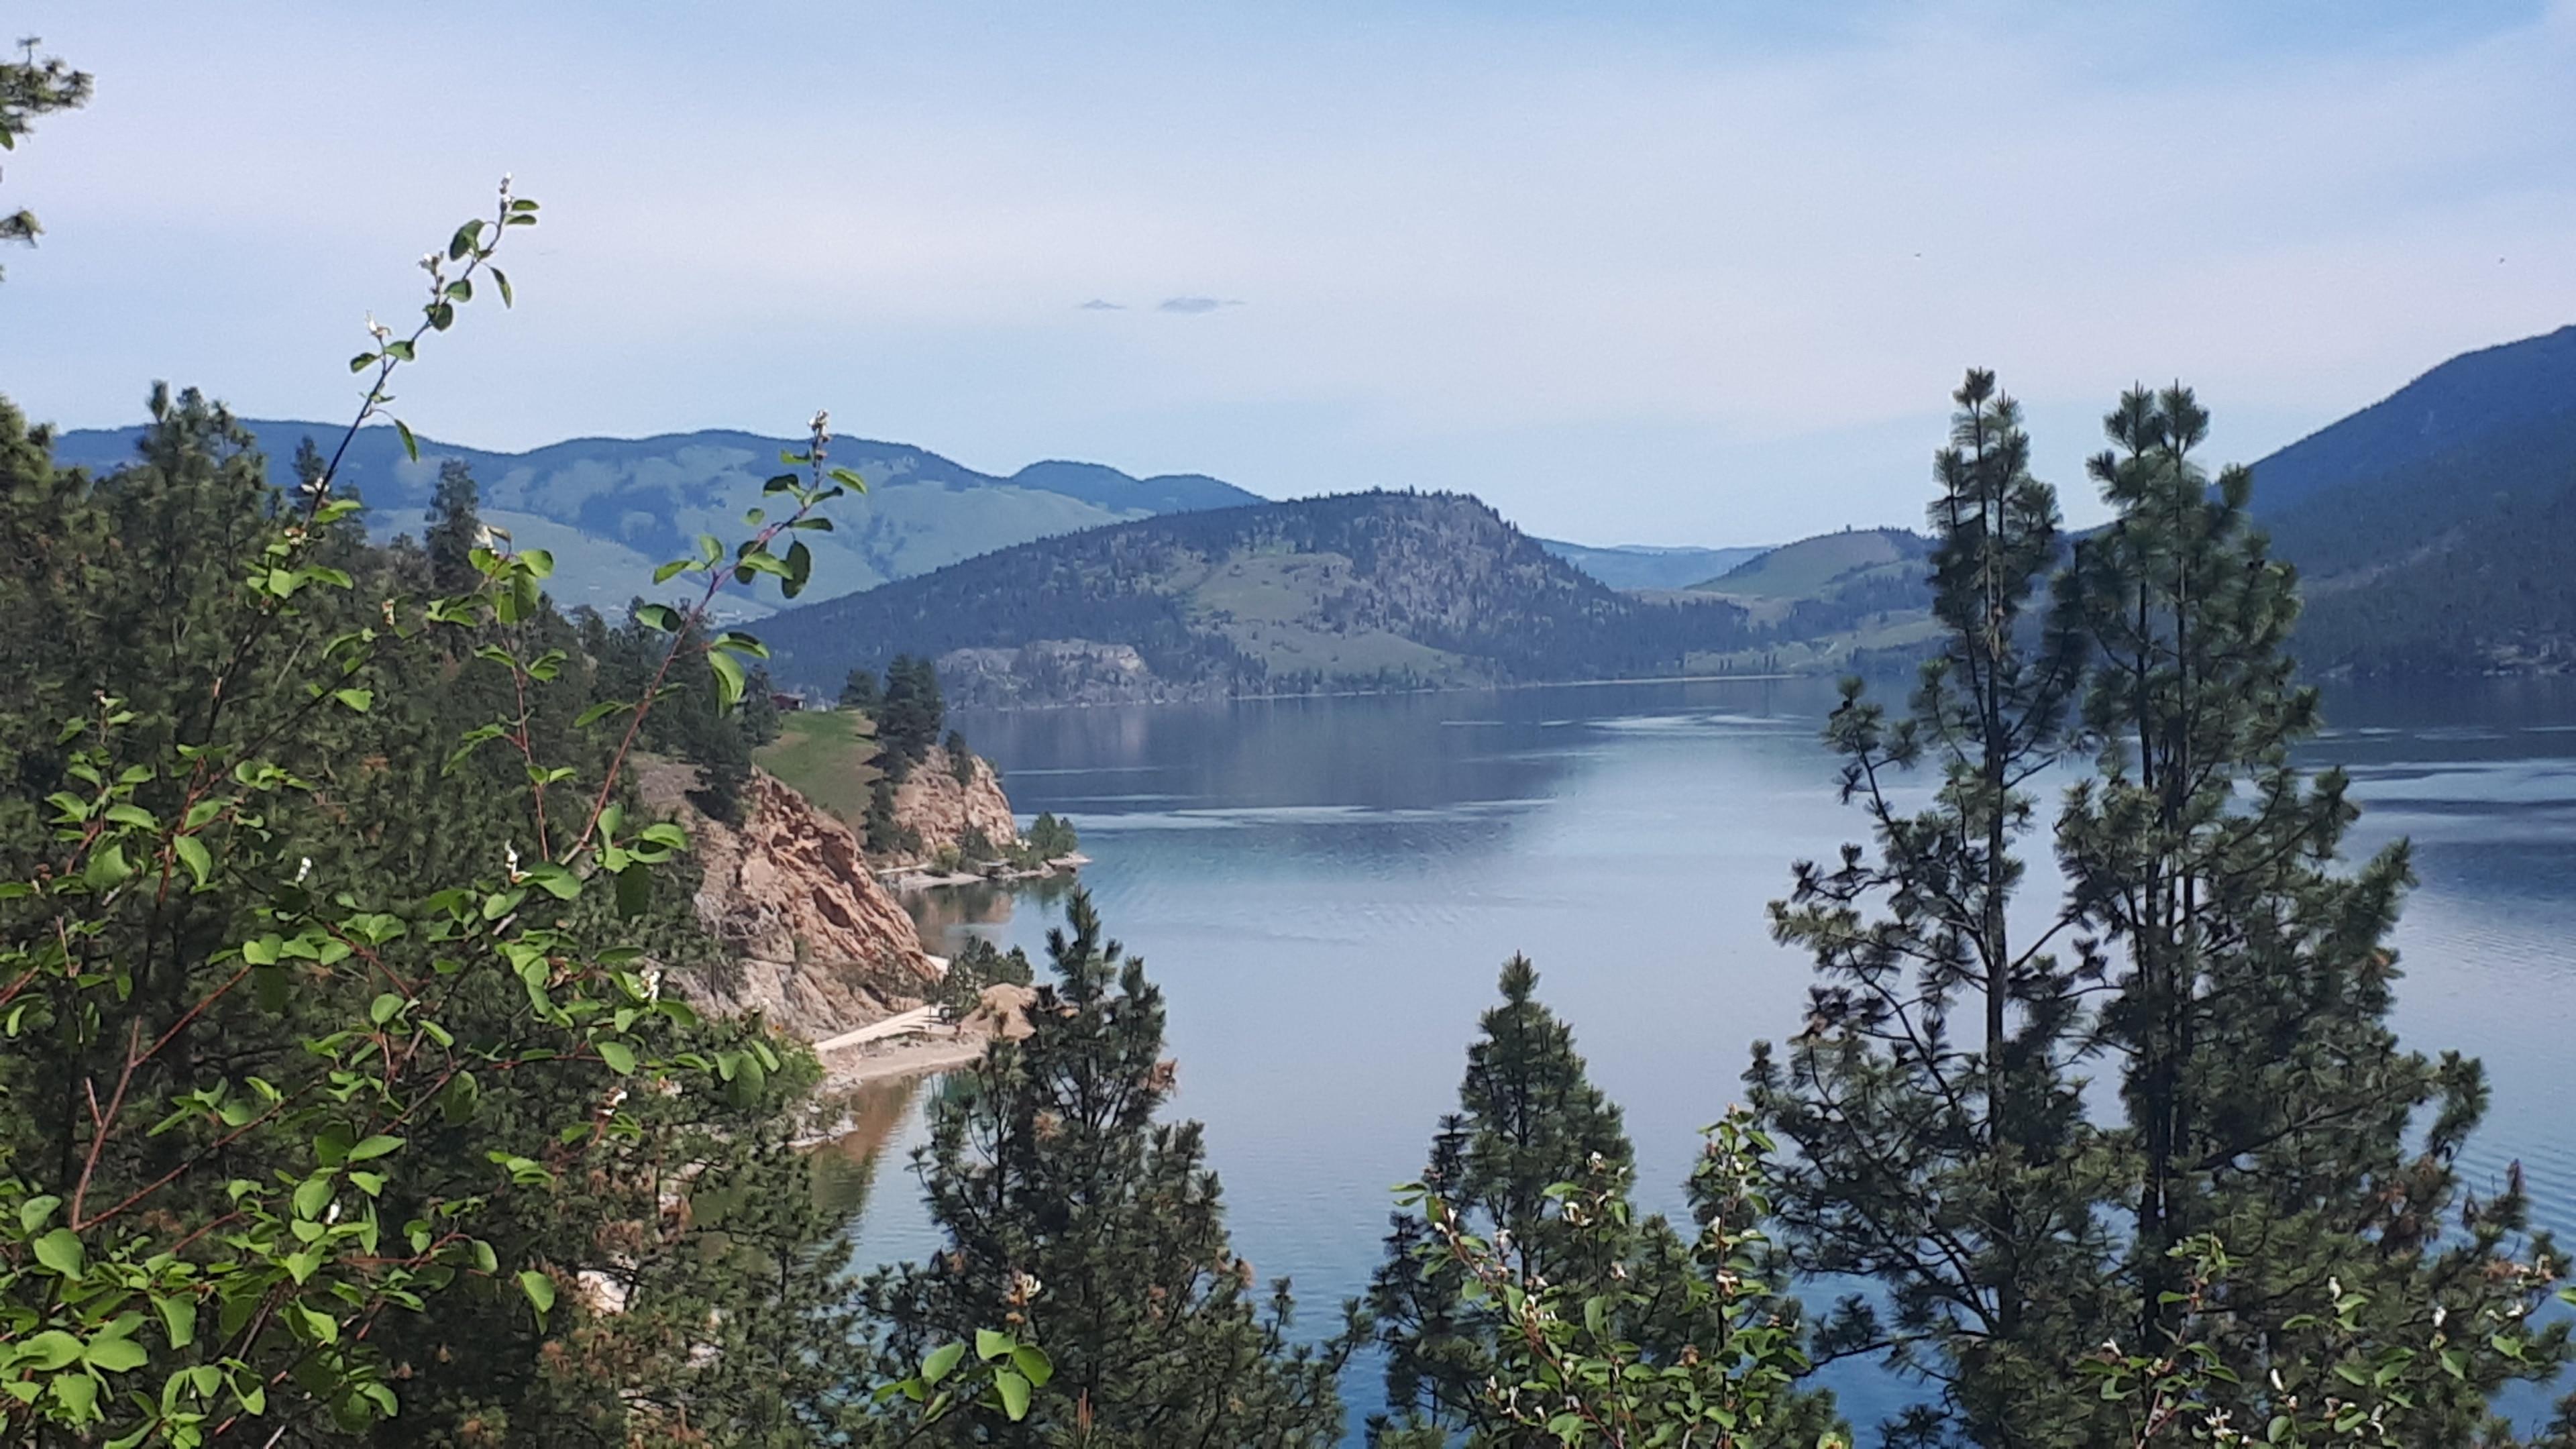 Kalamalka Lake, Vernon, British Columbia, Canada